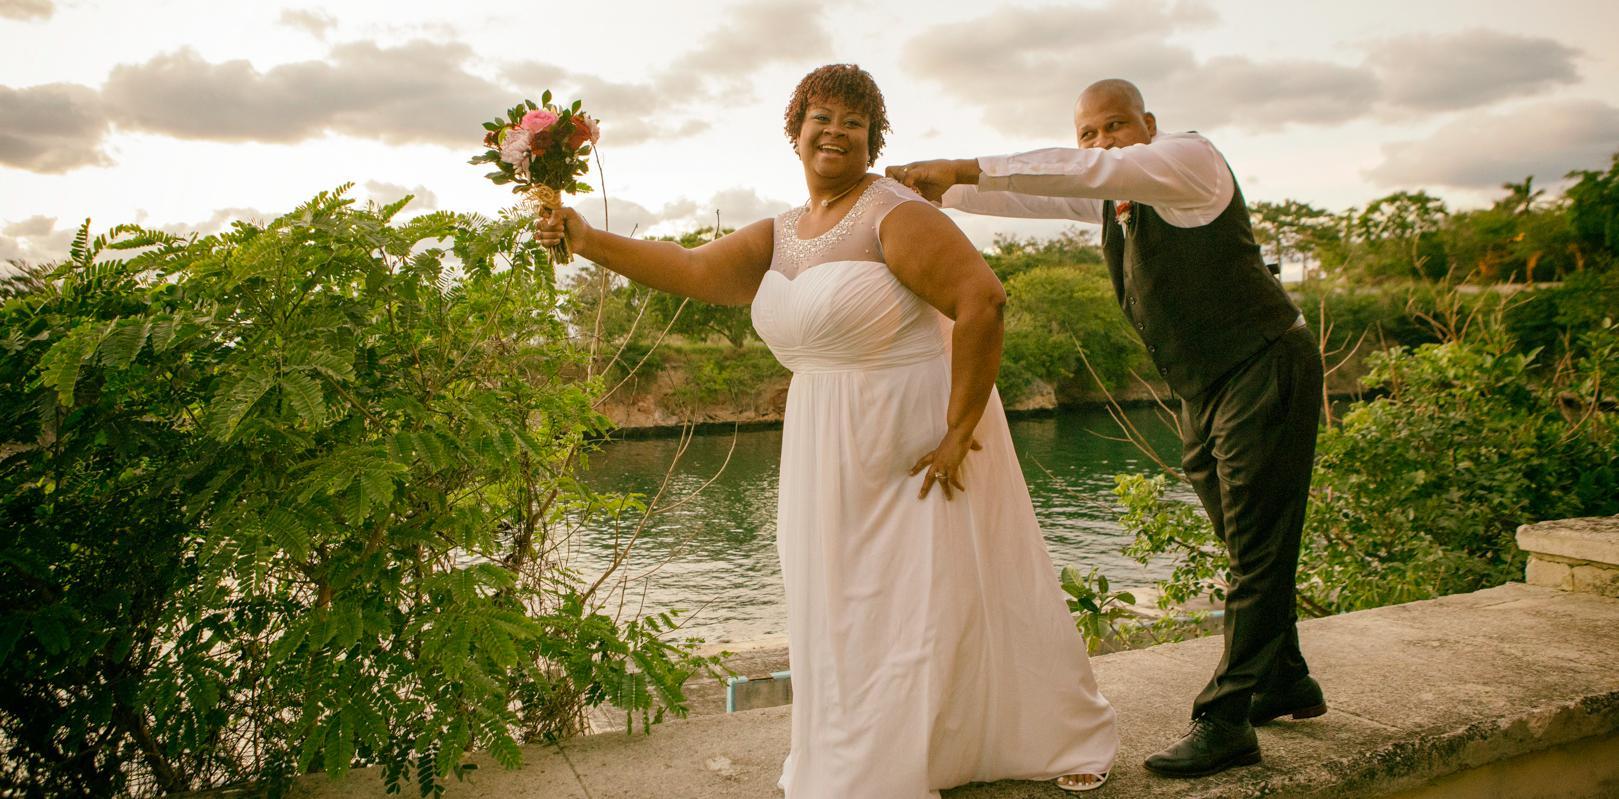 bodas-sin-clasificar-sin-tema-cuba-42142.jpg